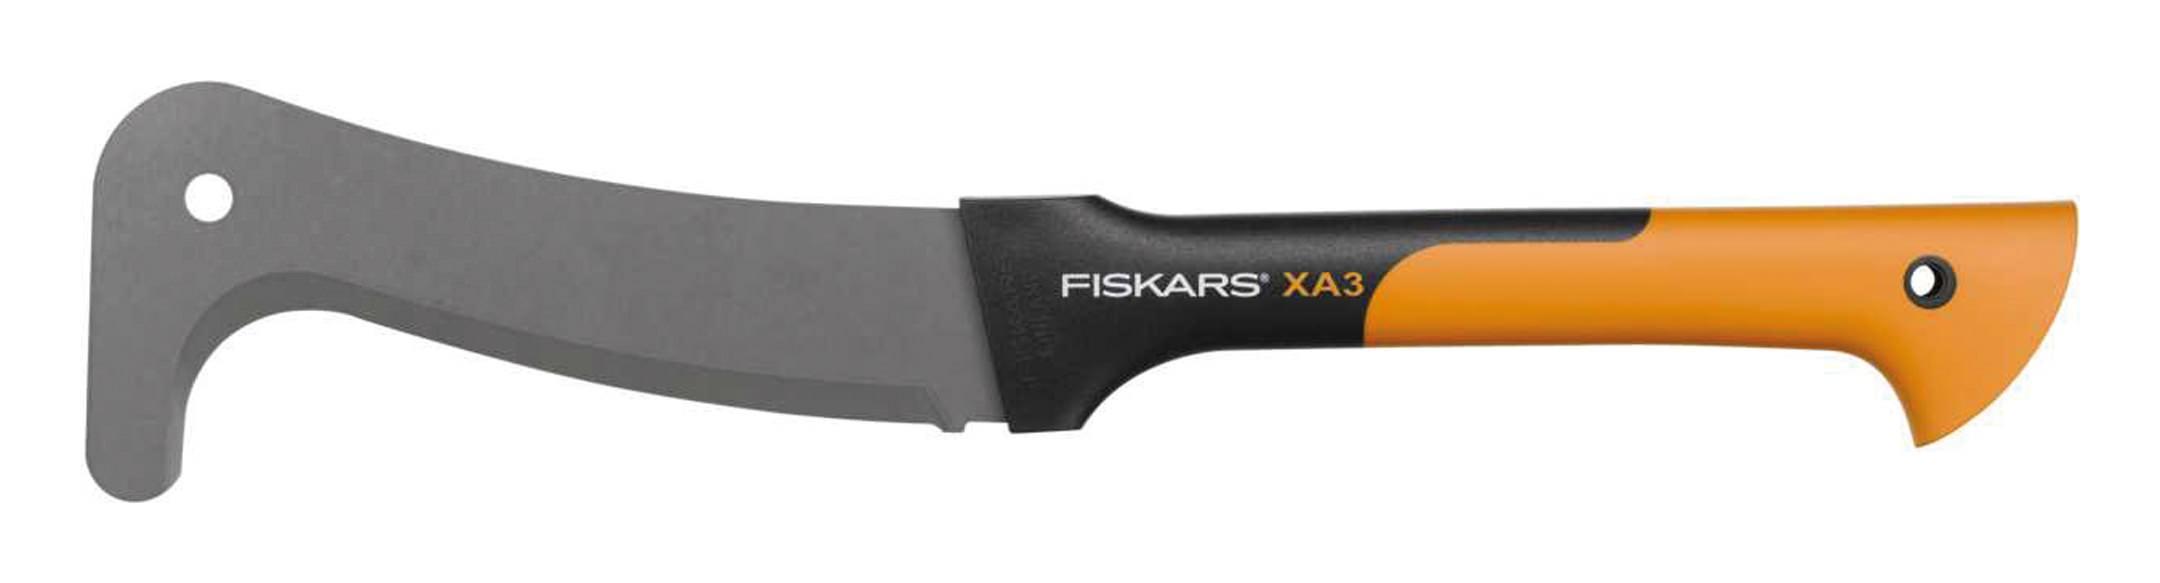 Fiskars WoodXpert Machete XA3 - 1003609